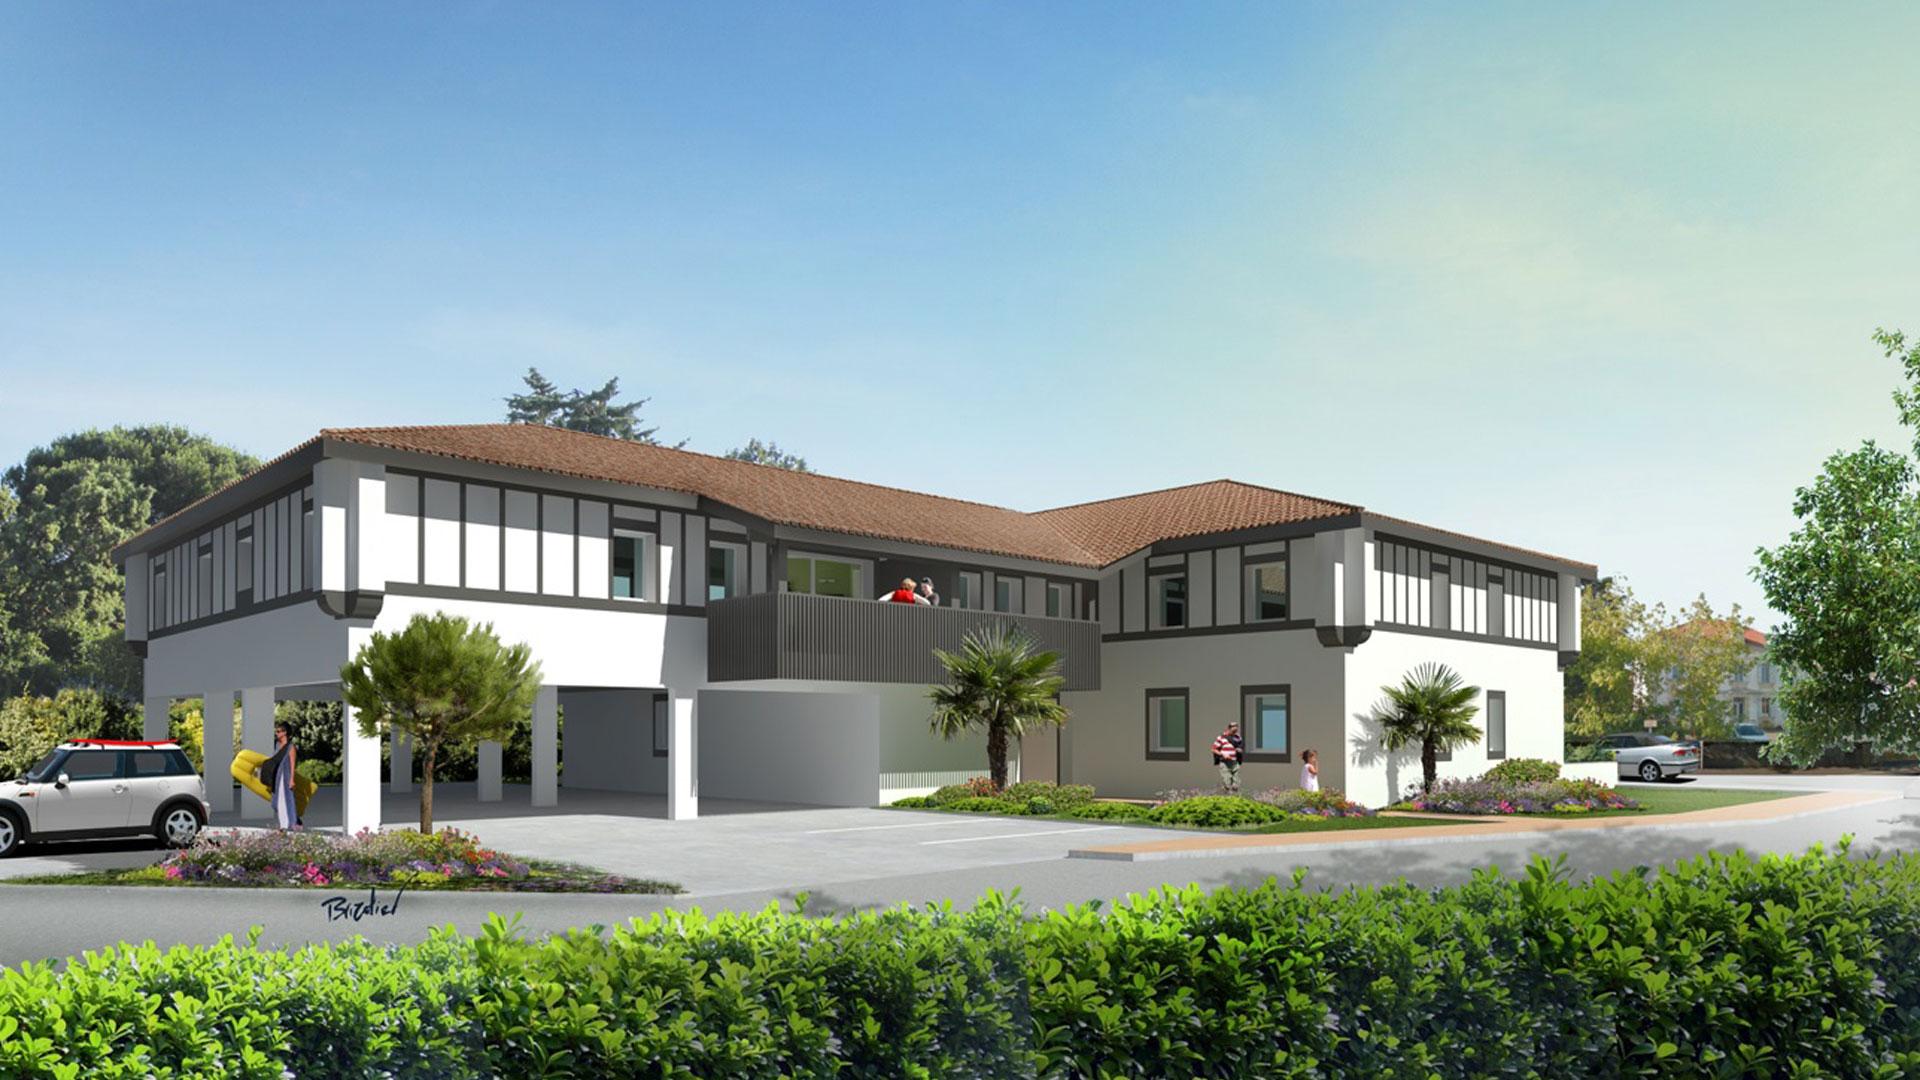 Residence Ametzia à Soustons - SAGIM Immobilier